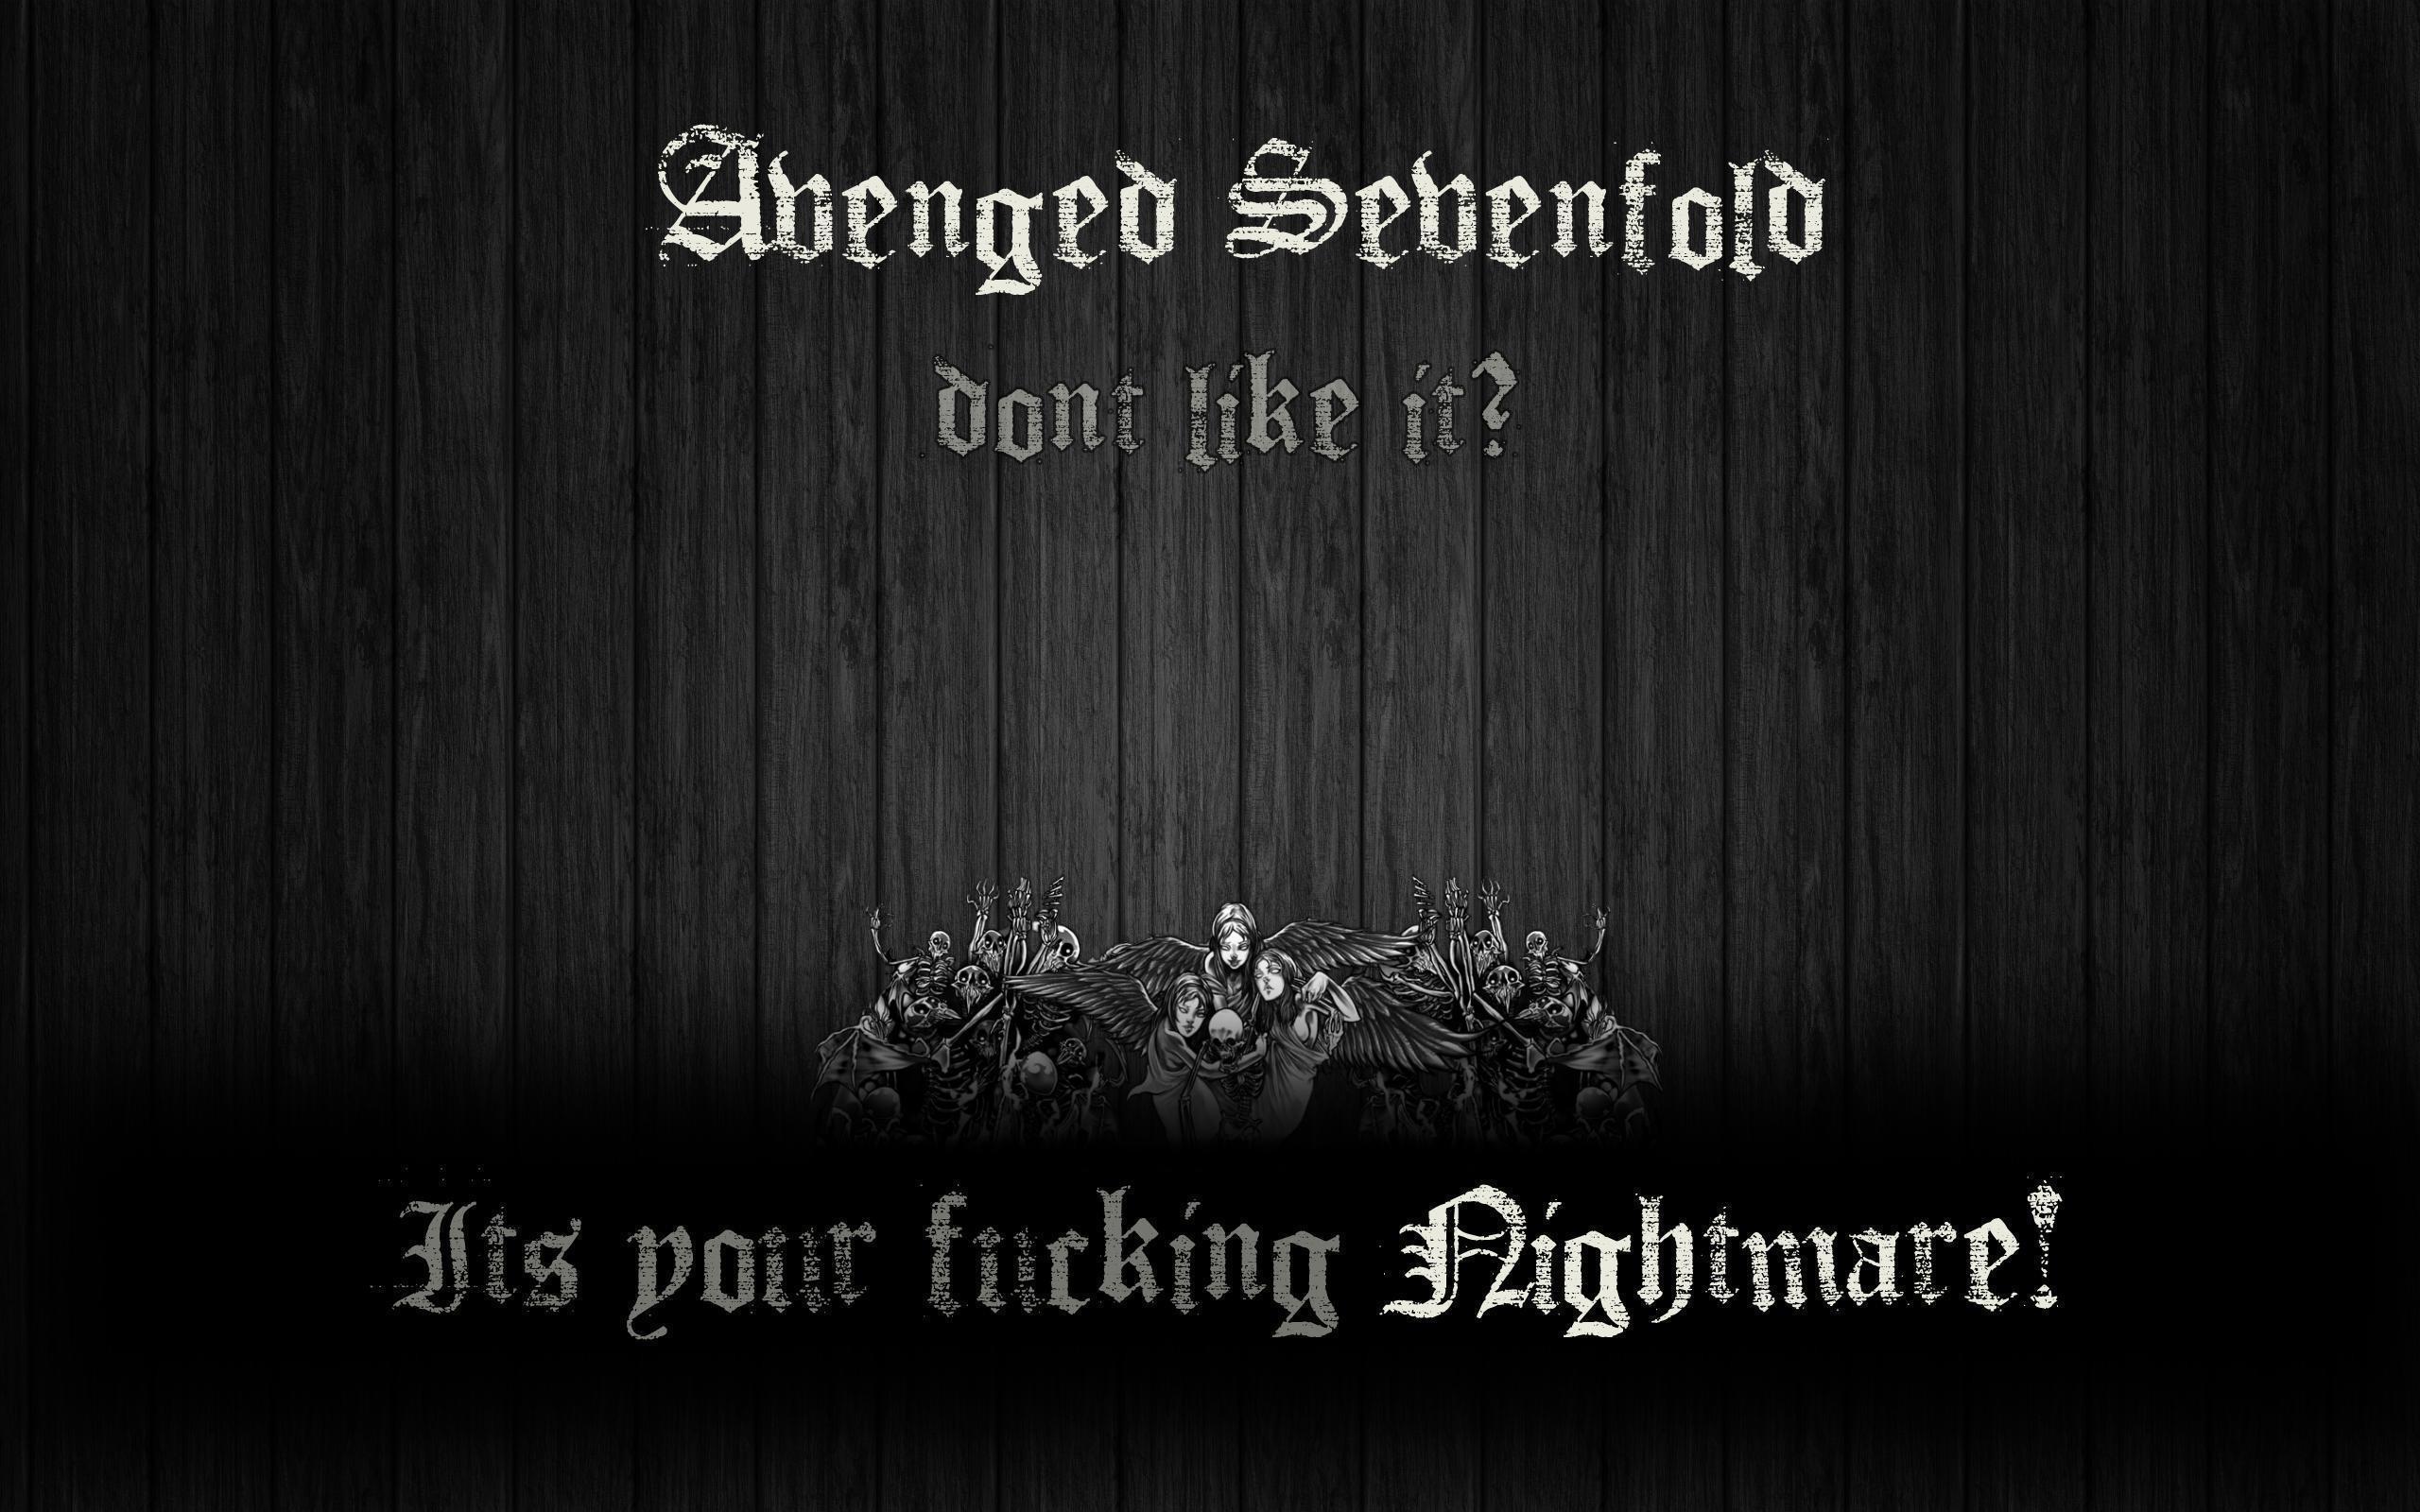 Avenged Sevenfold Wallpaper by ScientiaMucho on DeviantArt